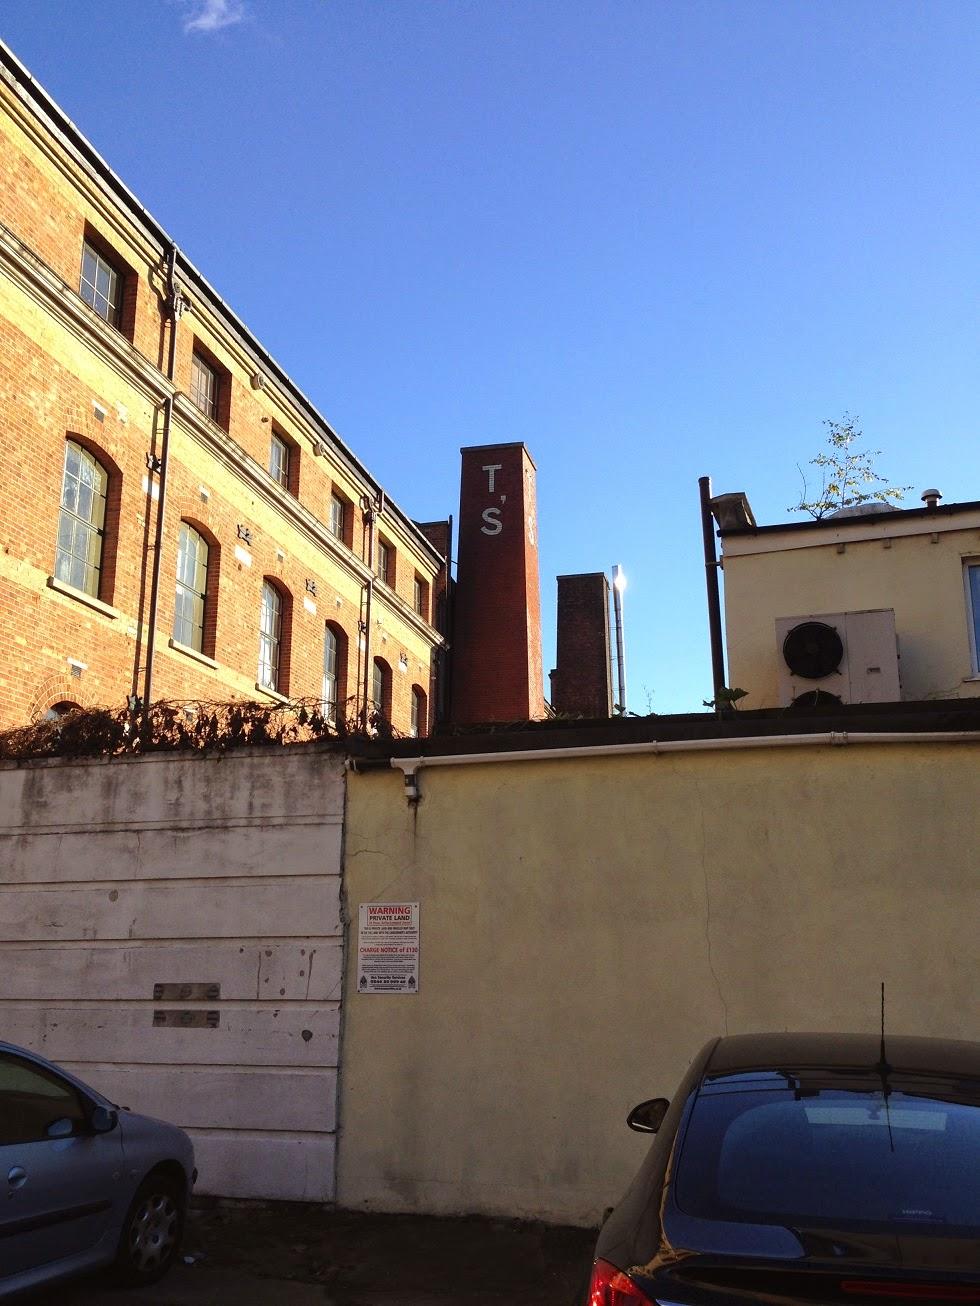 Spratt's Patent Limited dog food factory, Limehouse Cut, London